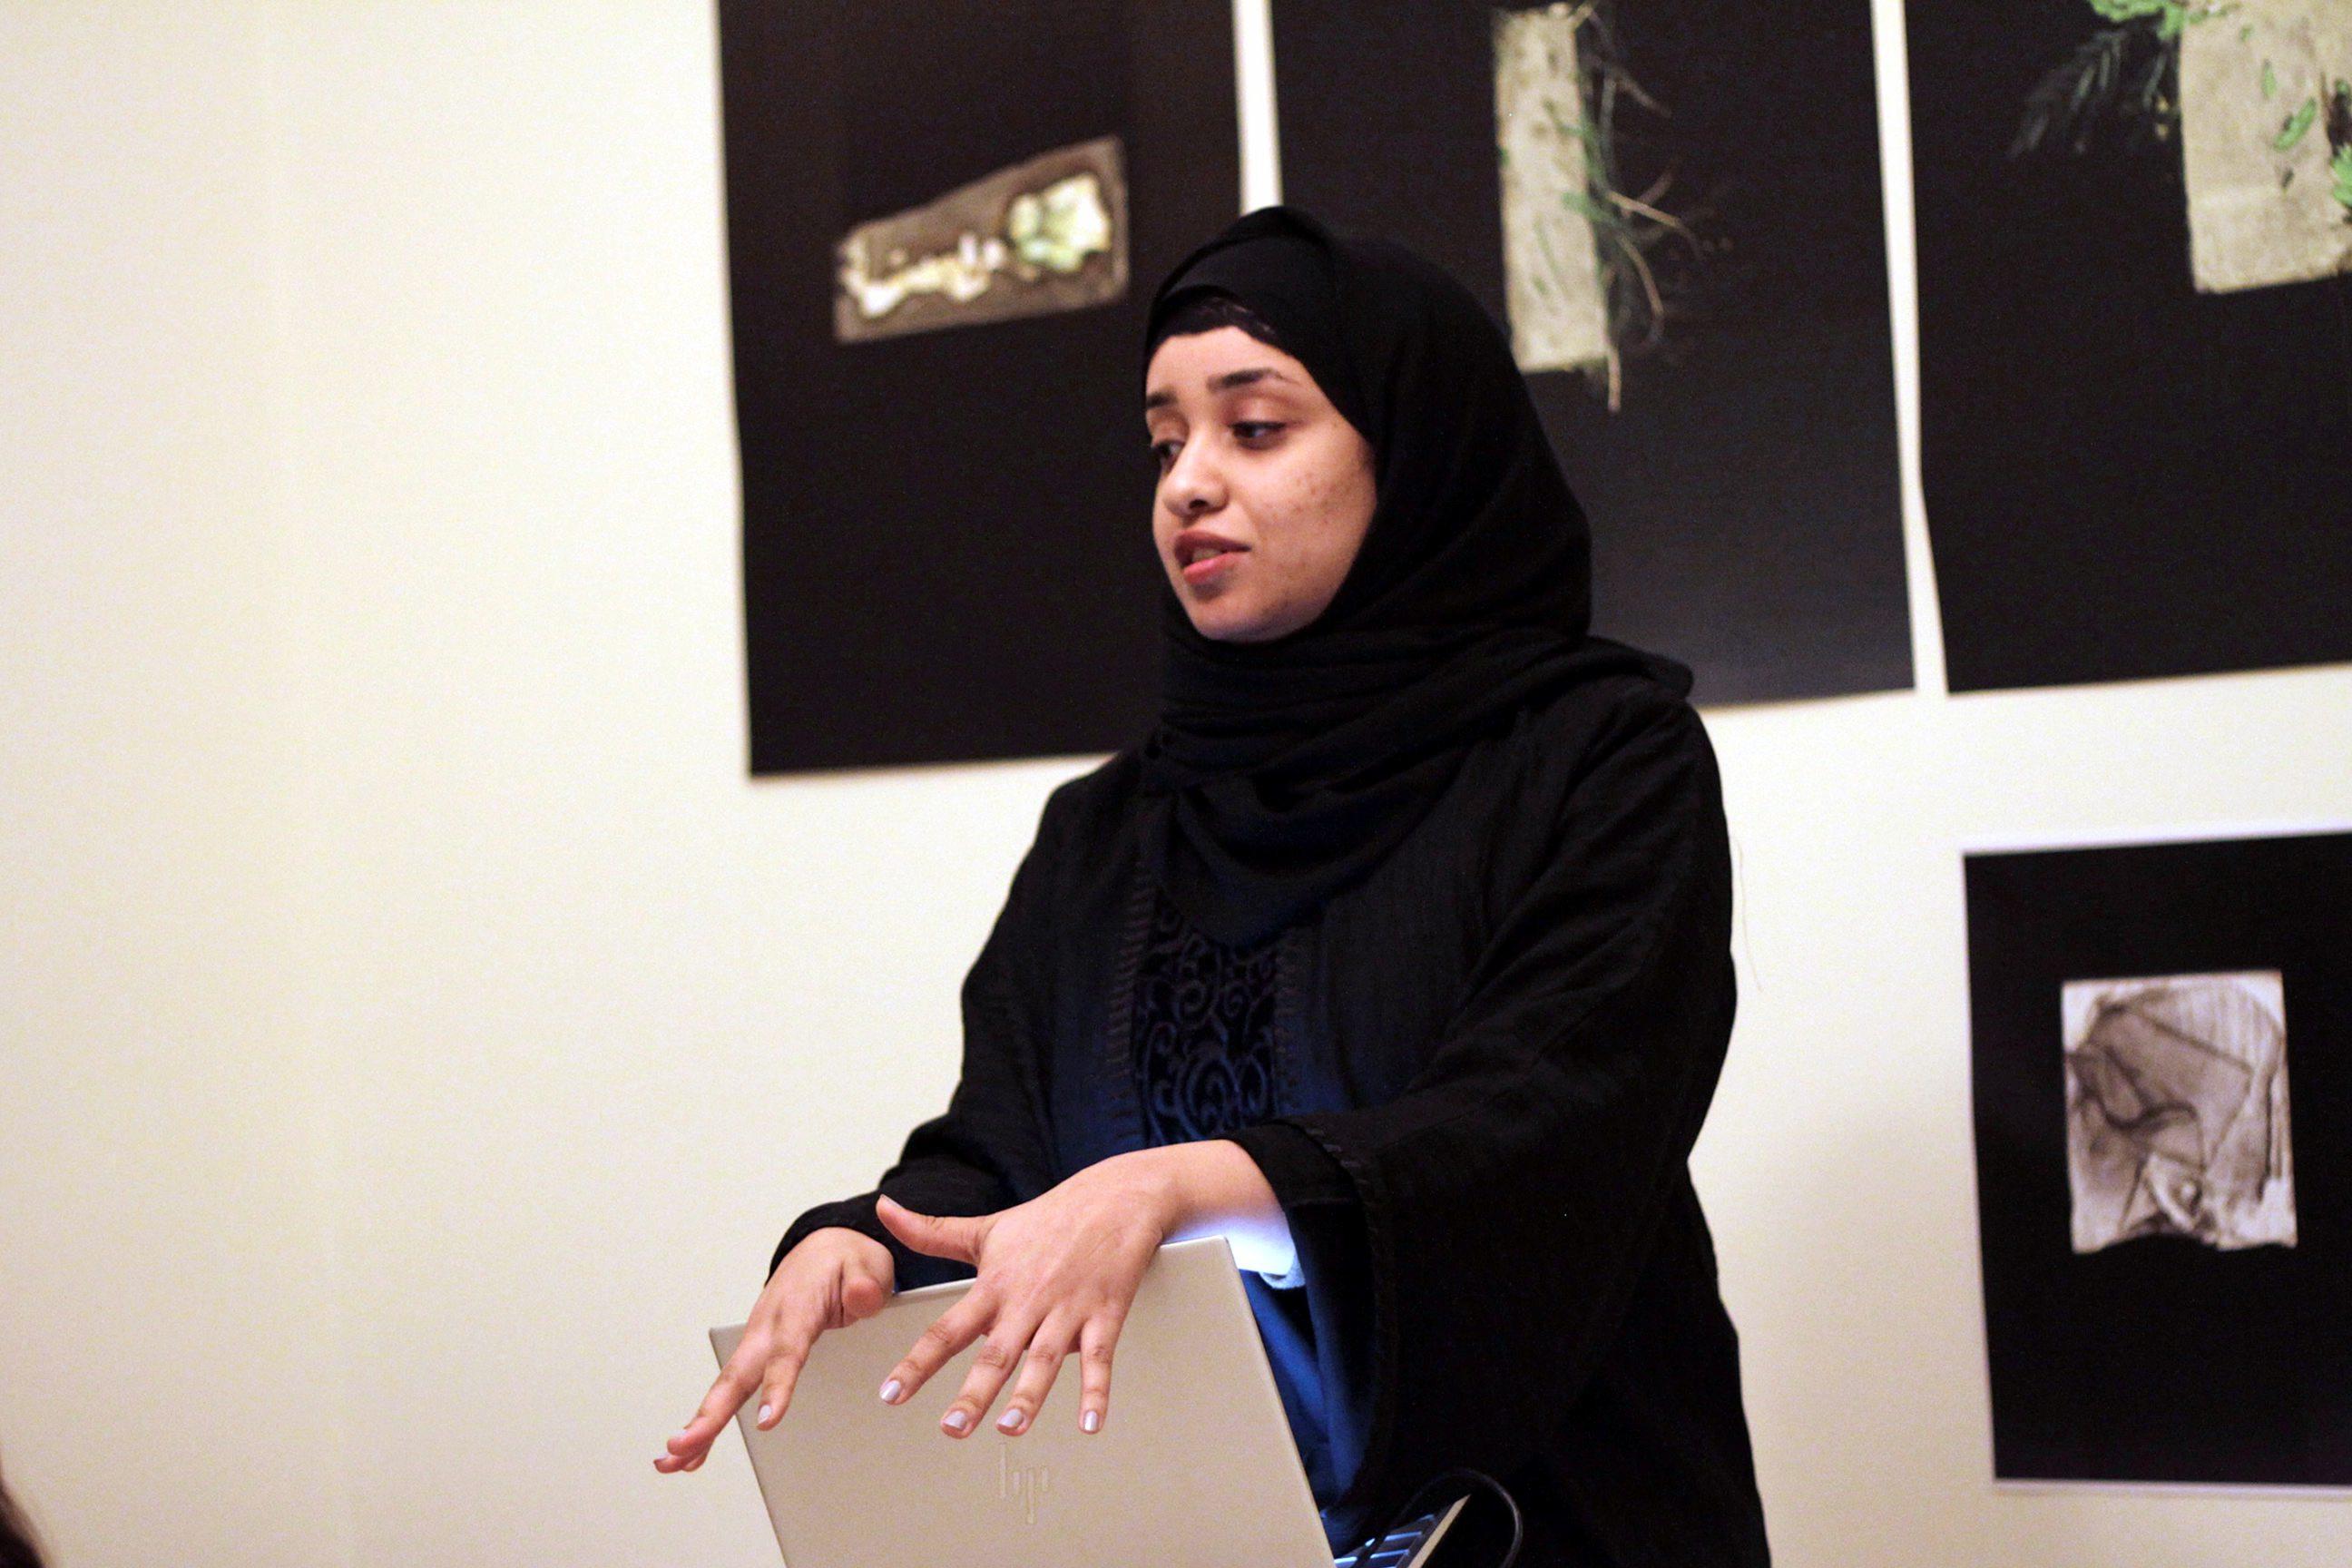 Ameena Aljarman